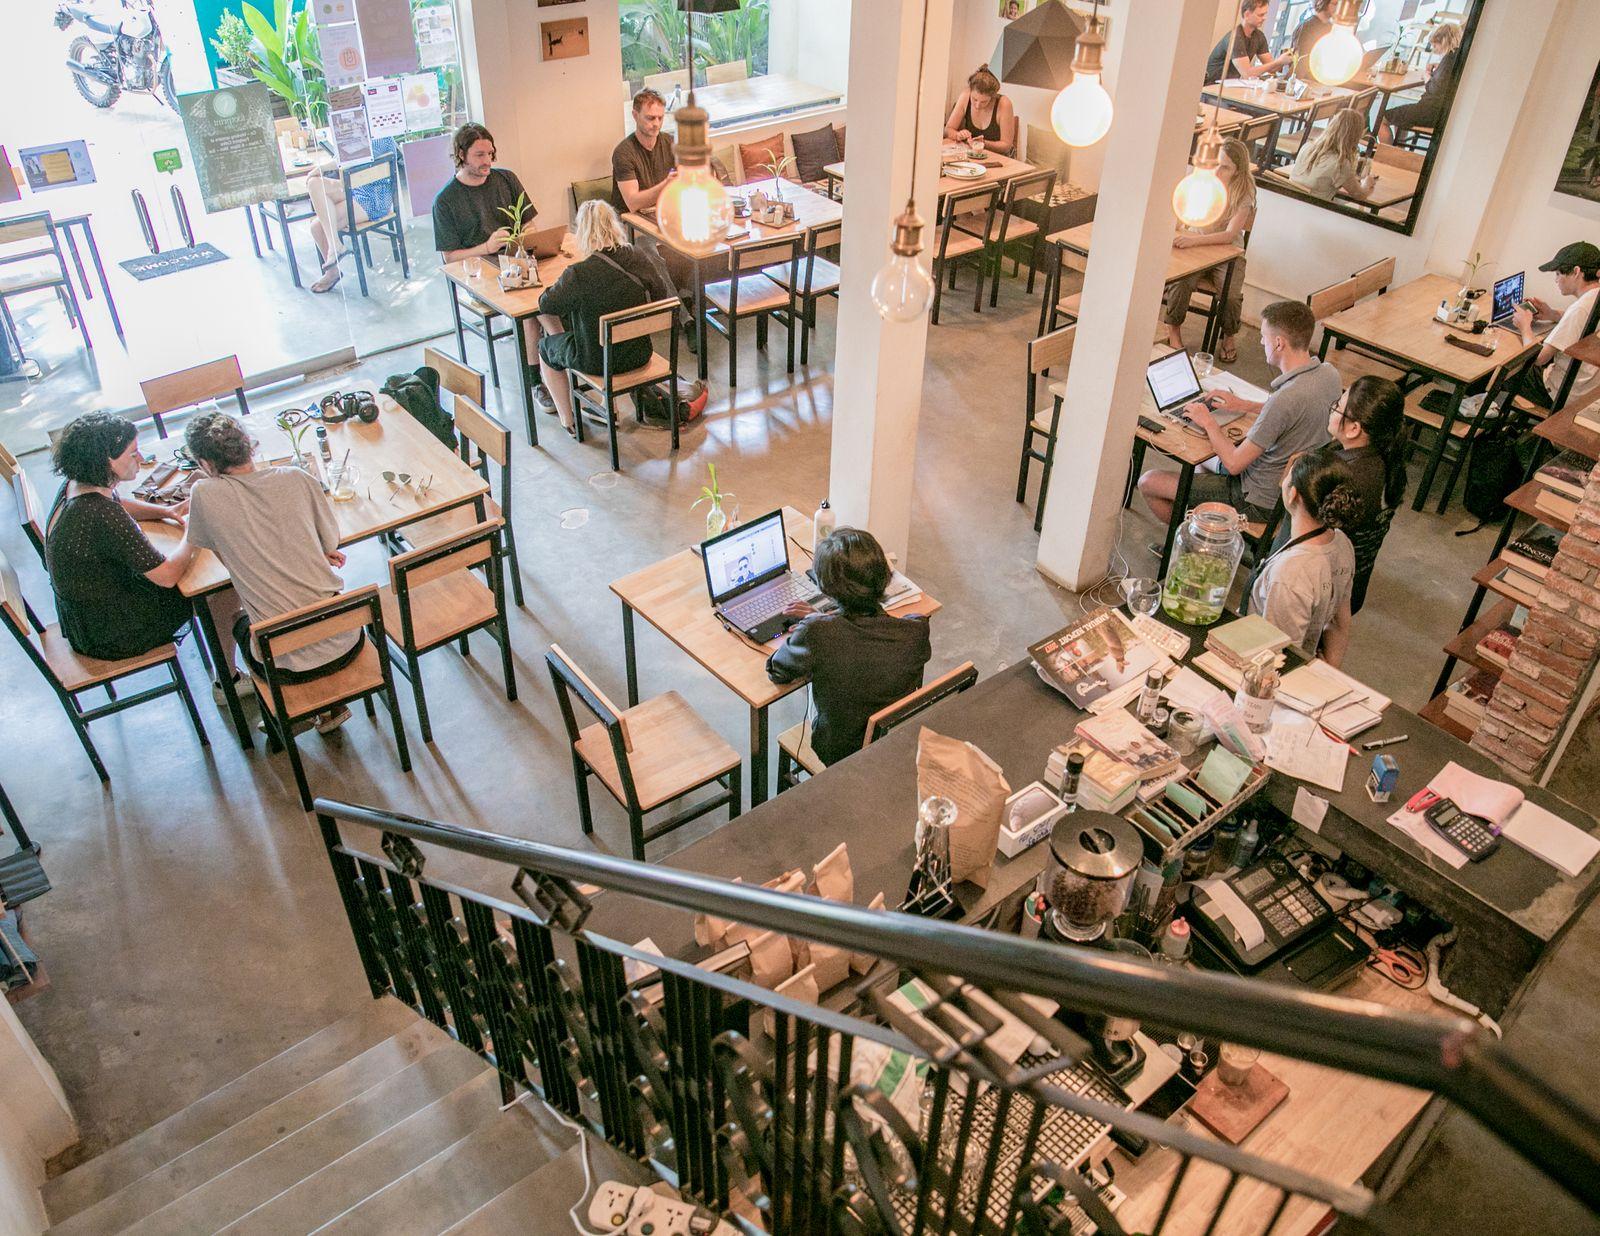 8_Gallery1 - Footprint Cafe Siem Reap